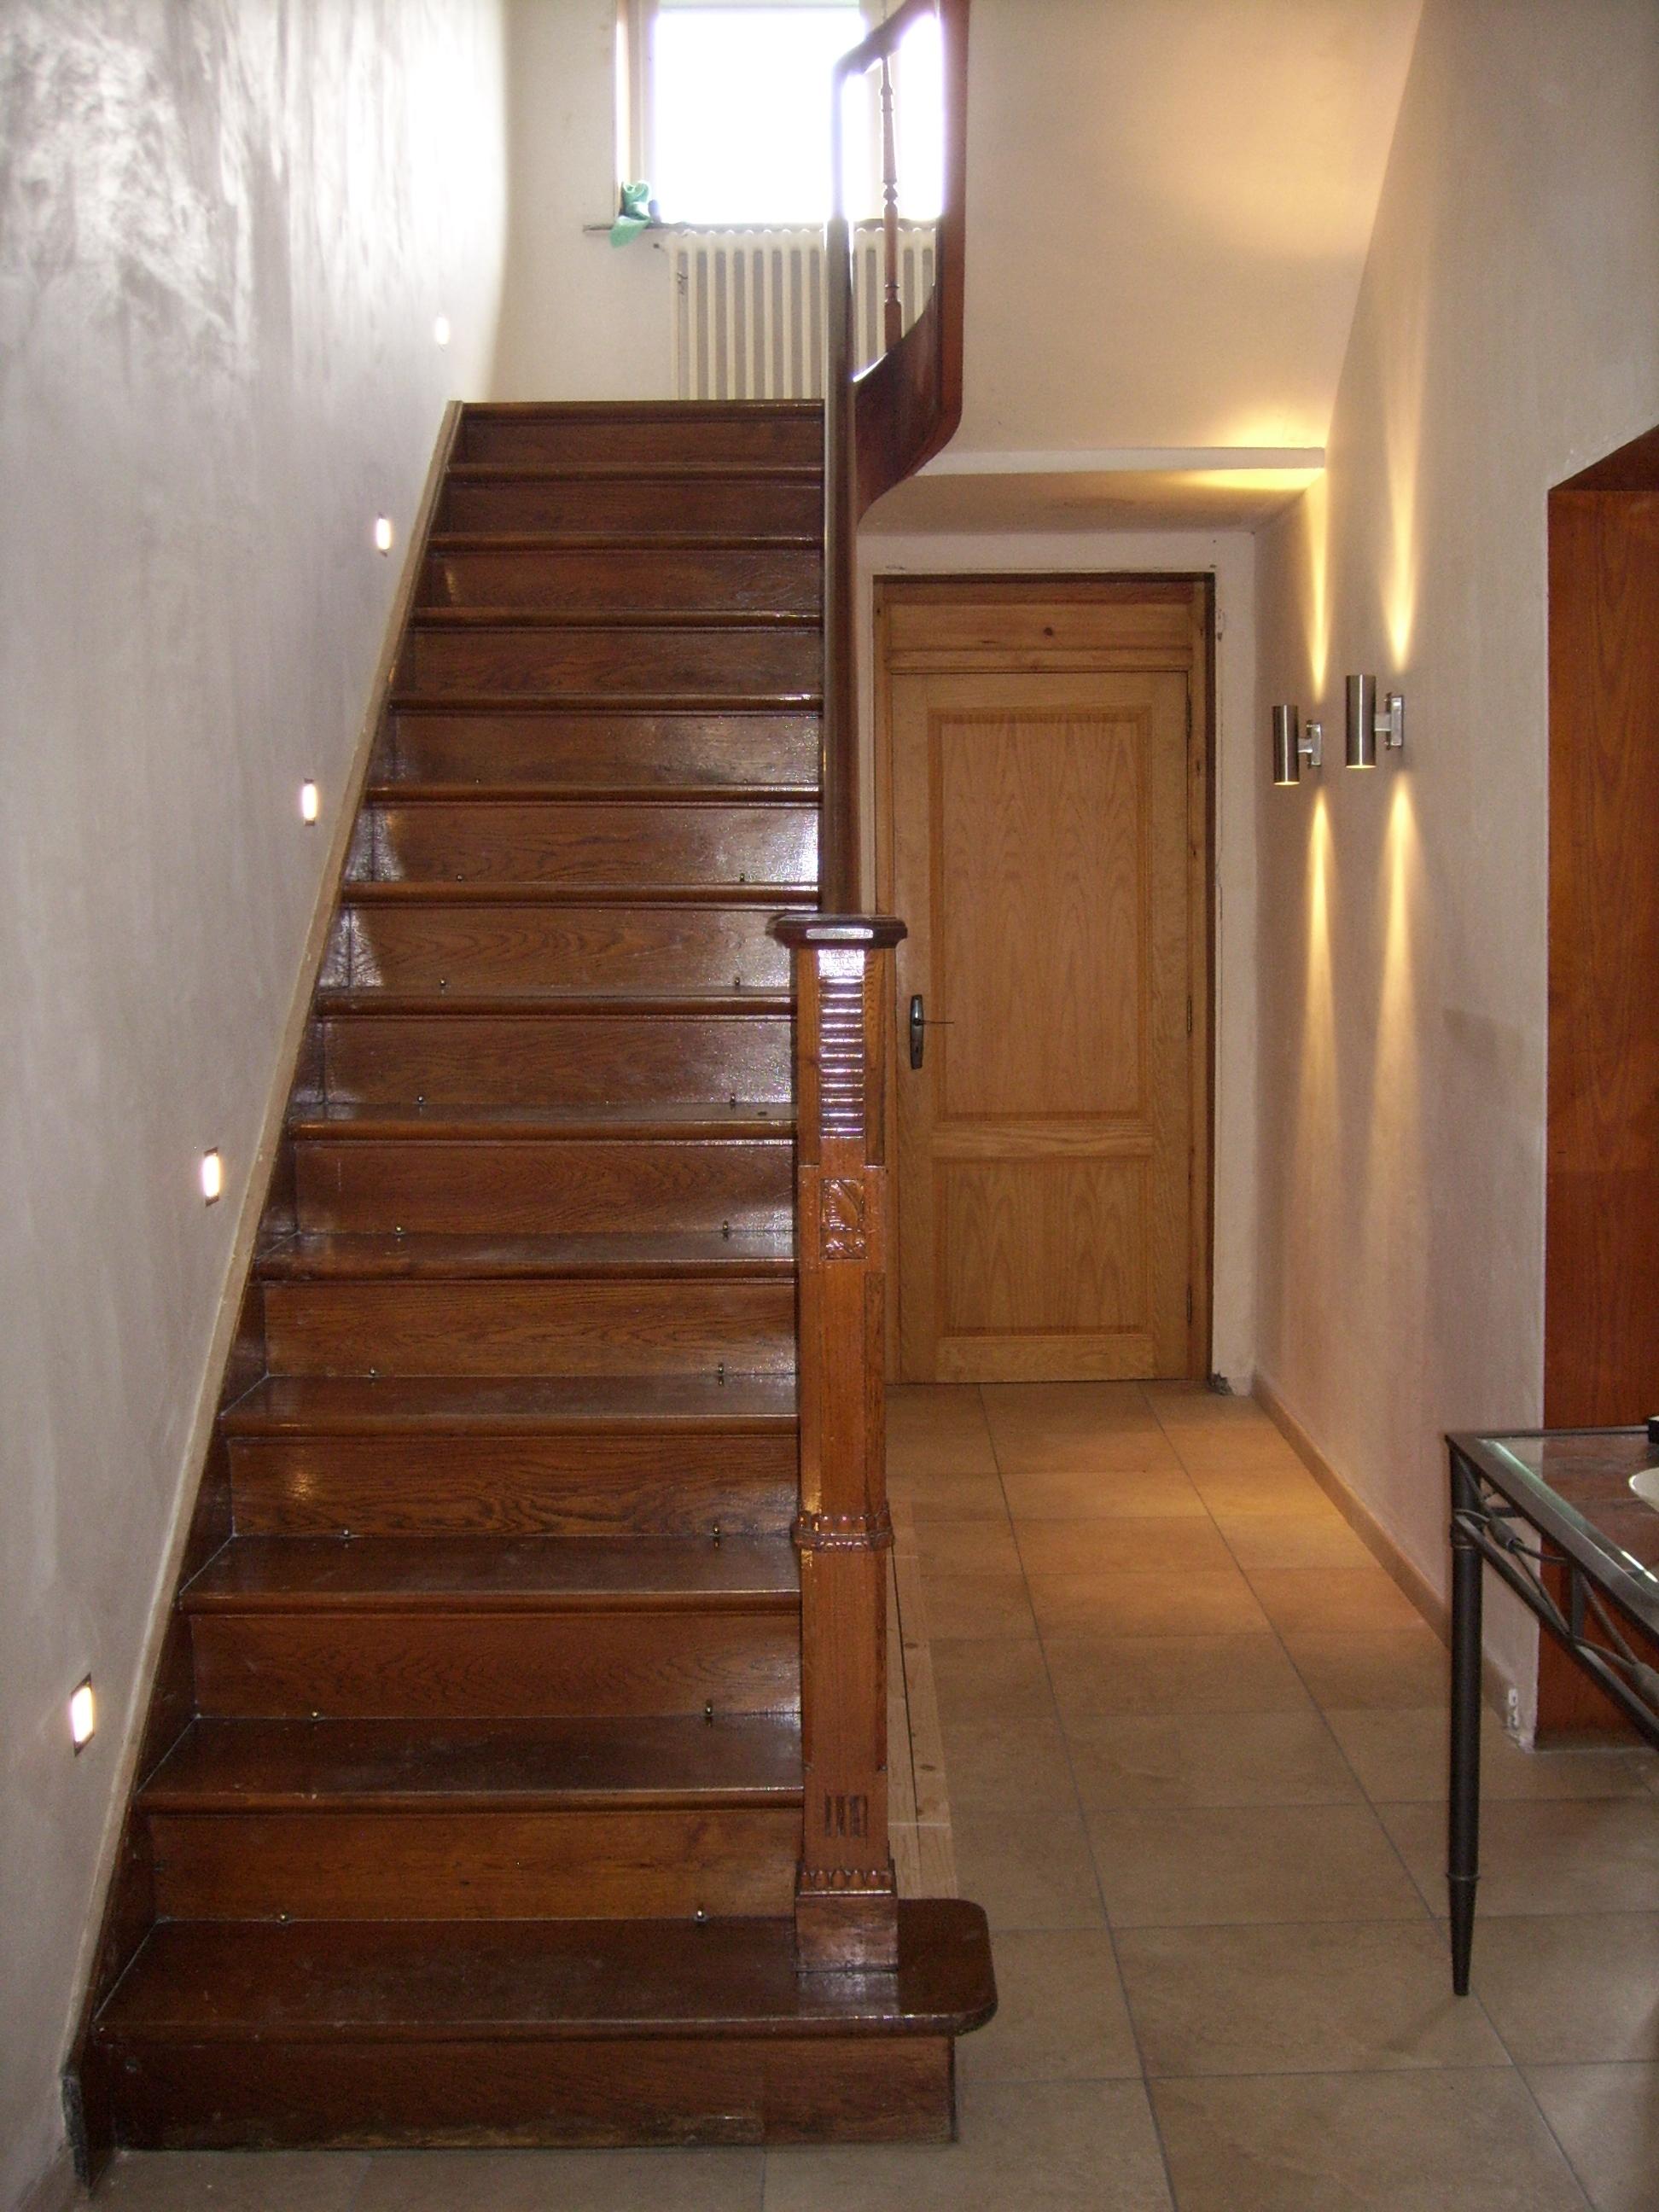 renover son escalier cheap comment recouvrir un escalier en bois affordable renover escalier. Black Bedroom Furniture Sets. Home Design Ideas